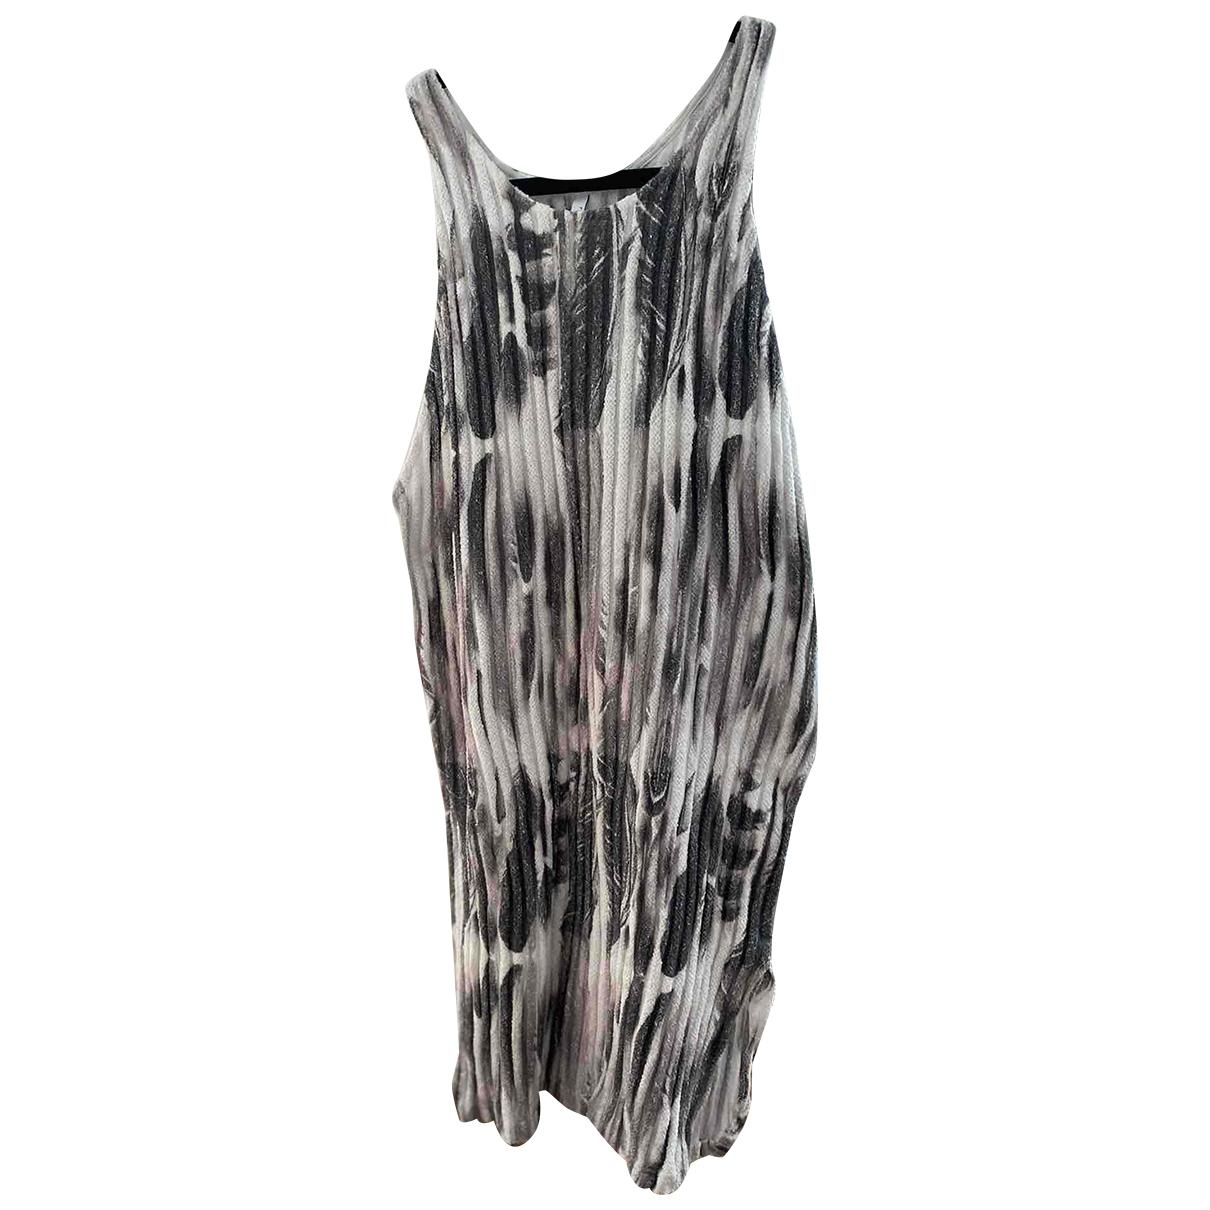 Faith Connexion \N Grey Cotton dress for Women M International